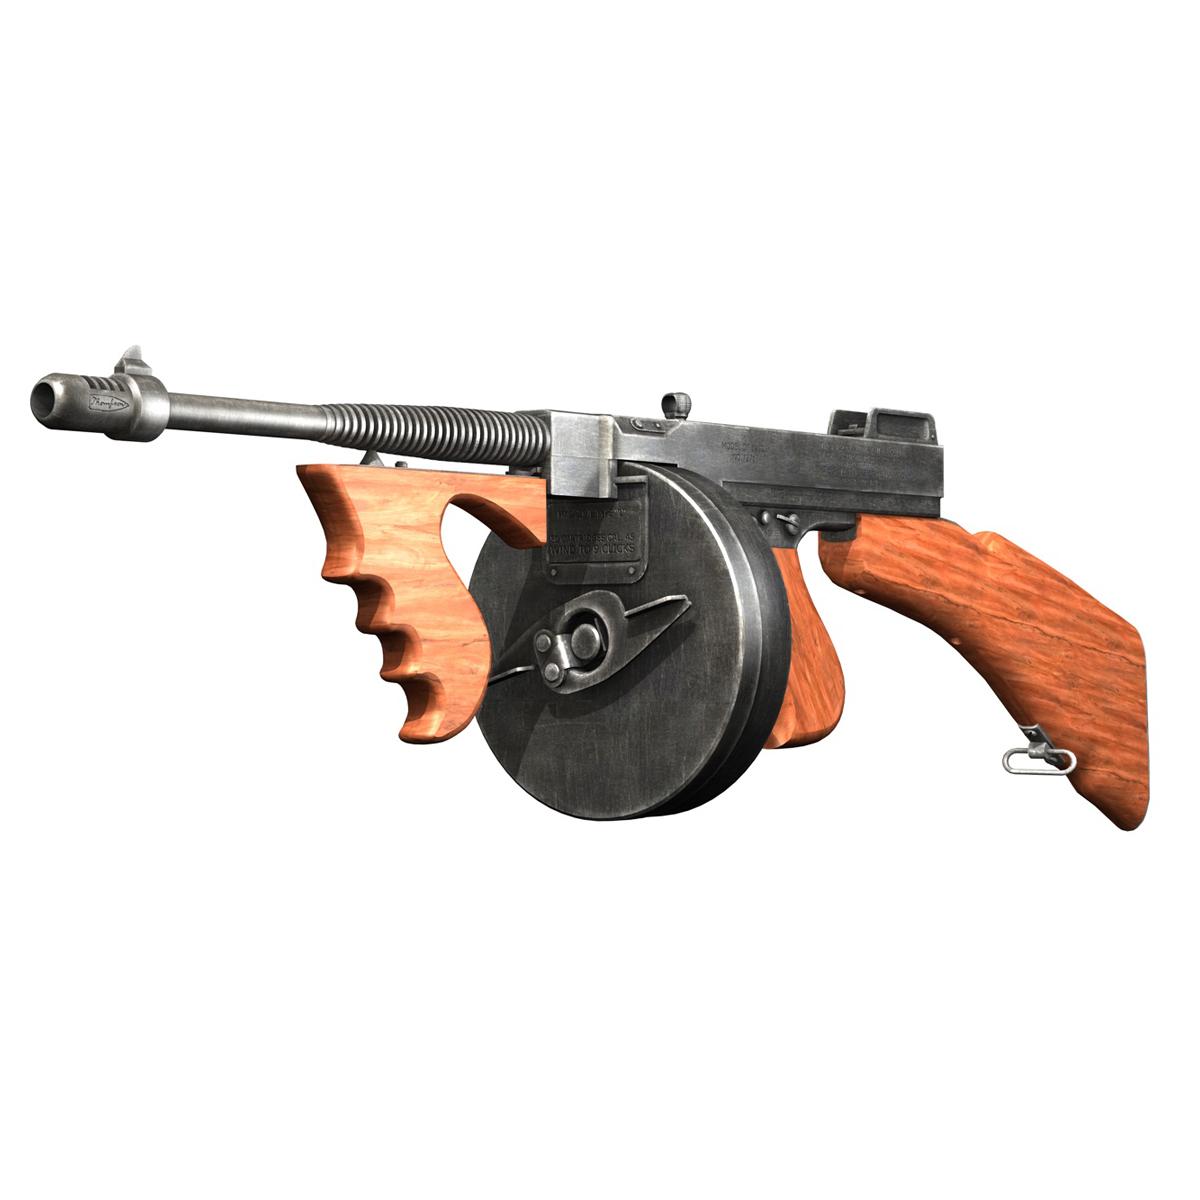 colt model1921 thompson submachine gun 3d model 3ds c4d lwo obj 264711